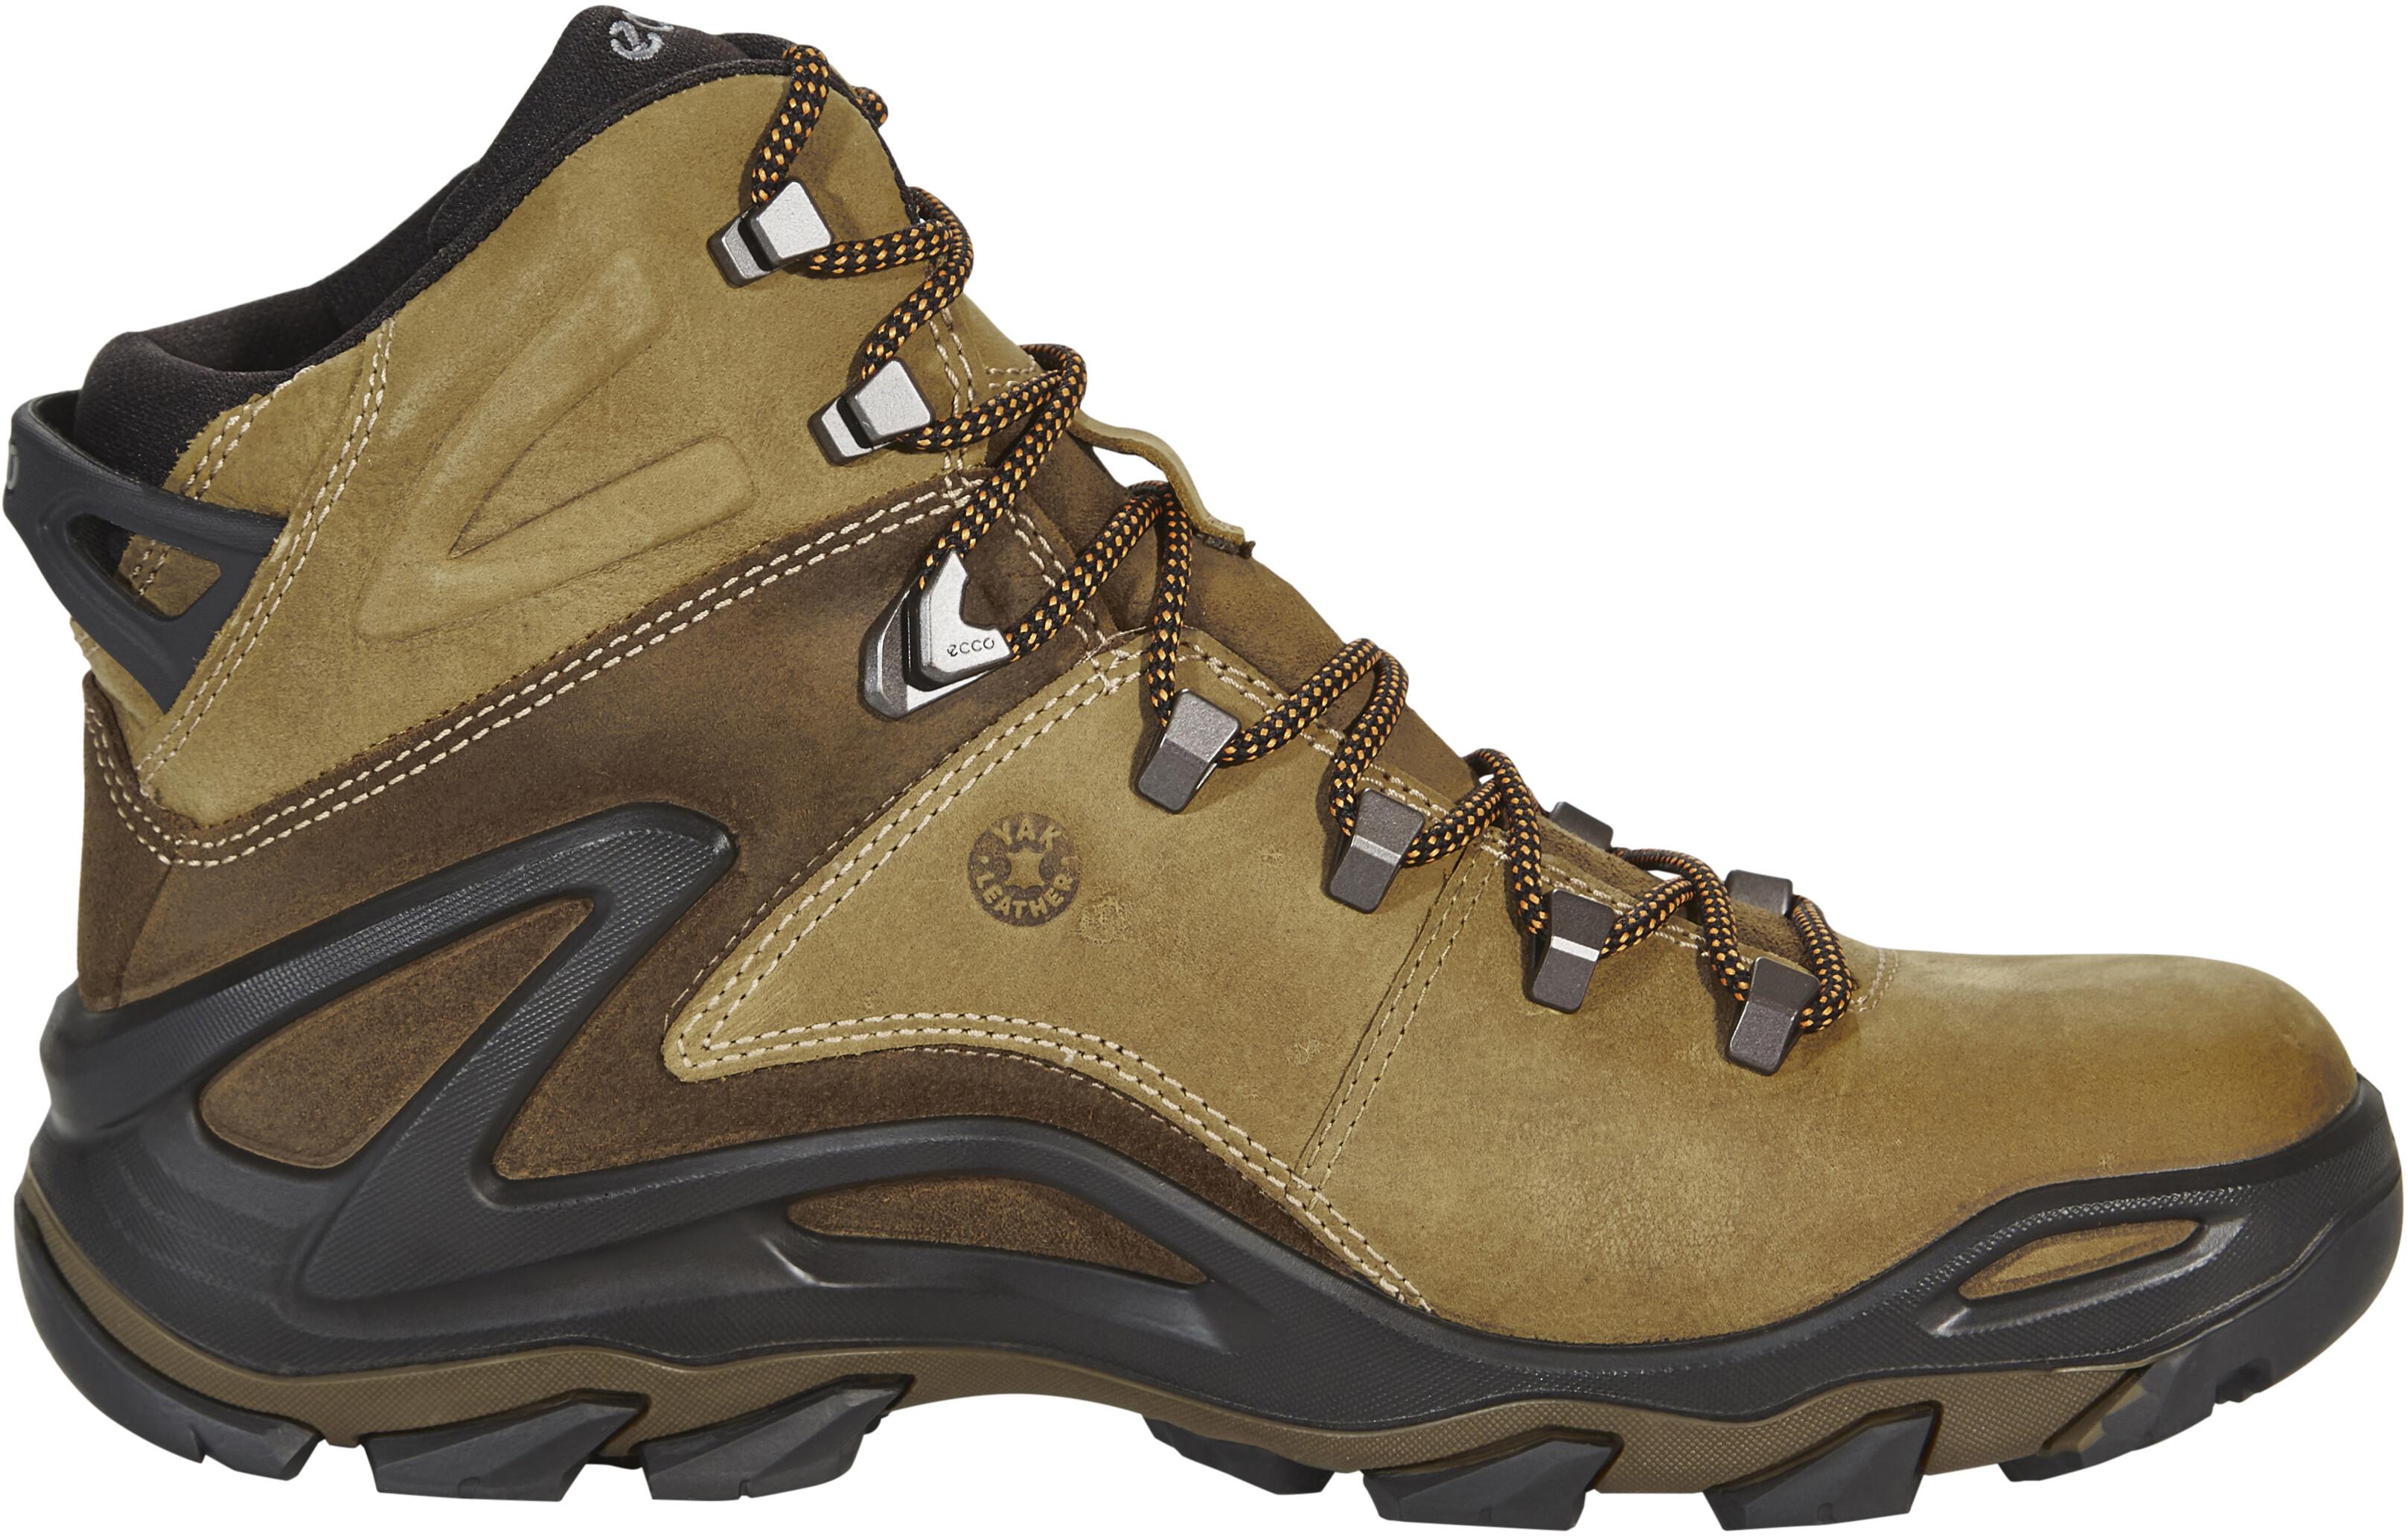 69c514fd4f4fbc ECCO Terra Evo Mid Shoes Men brown at Addnature.co.uk